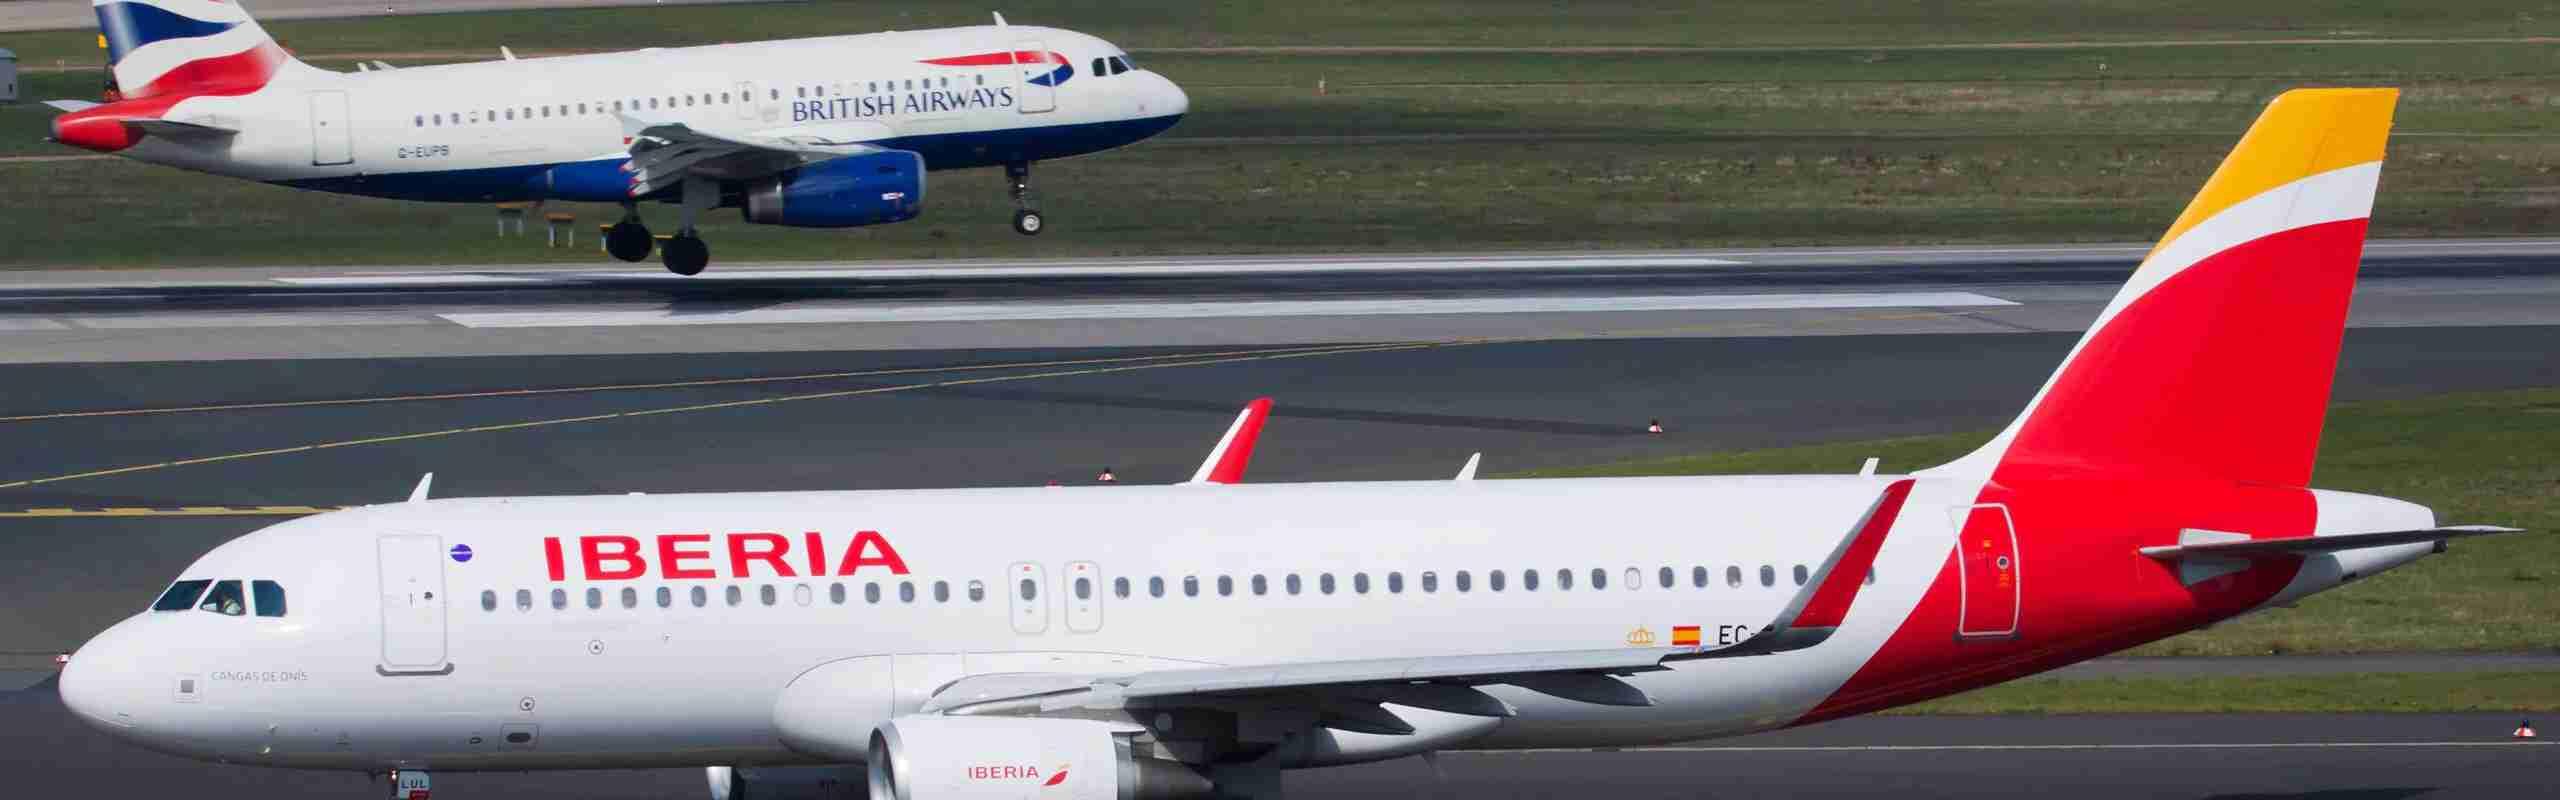 Iberia and British airways planes on the runway